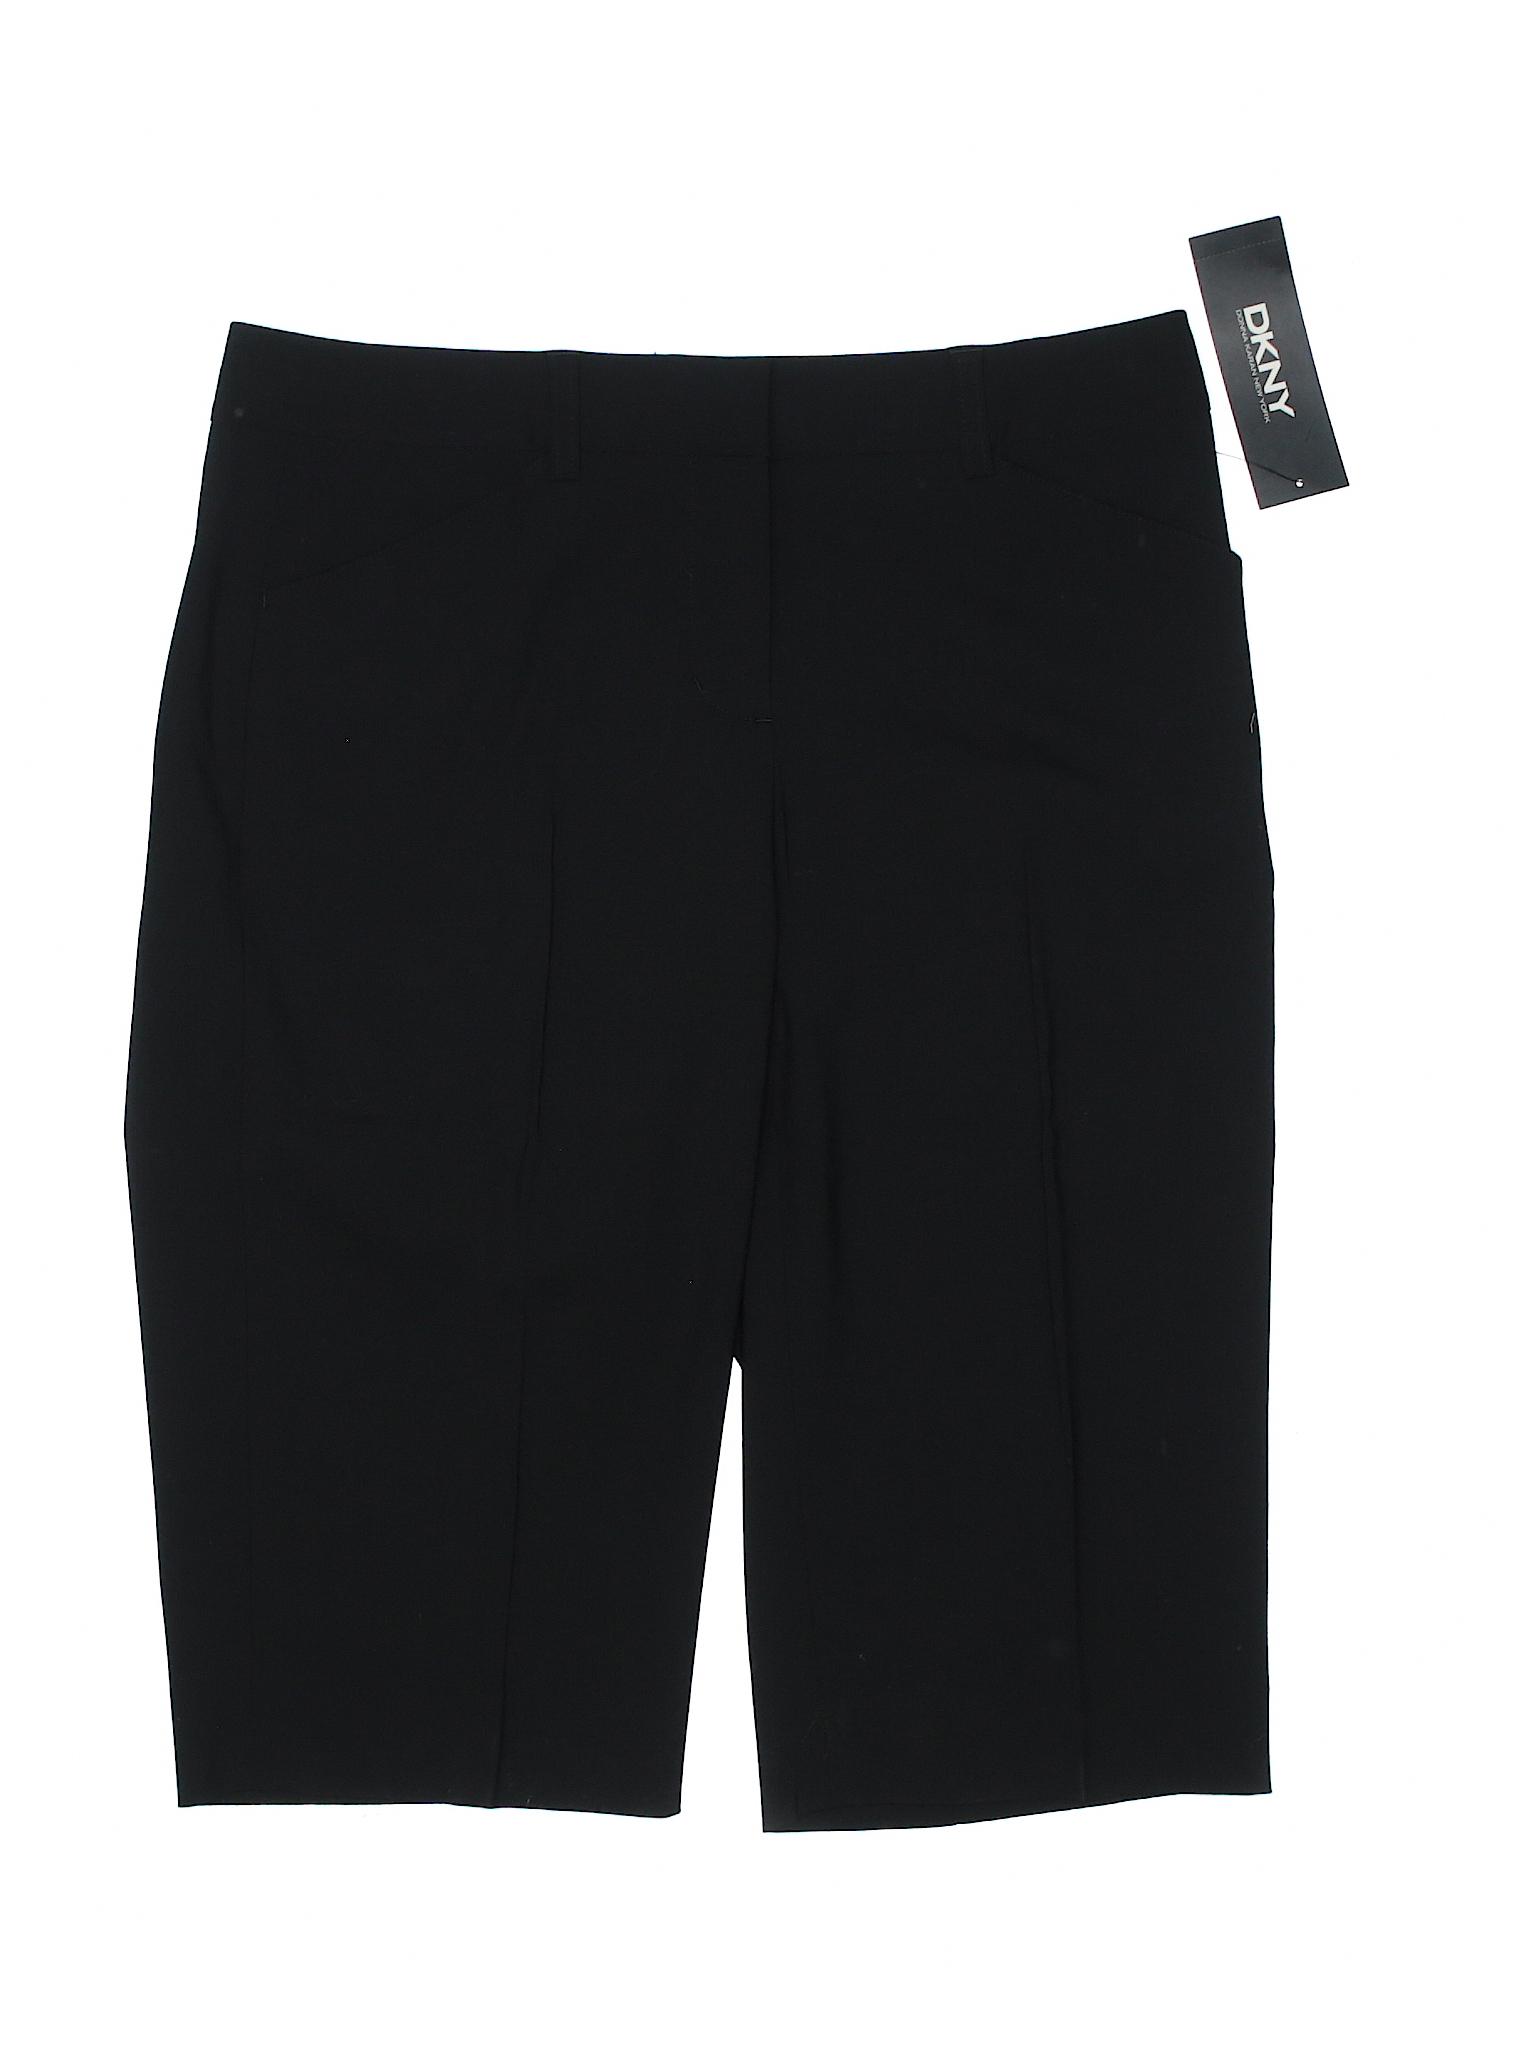 Dressy Shorts Boutique DKNY Boutique DKNY 1qvFx8Ywfn